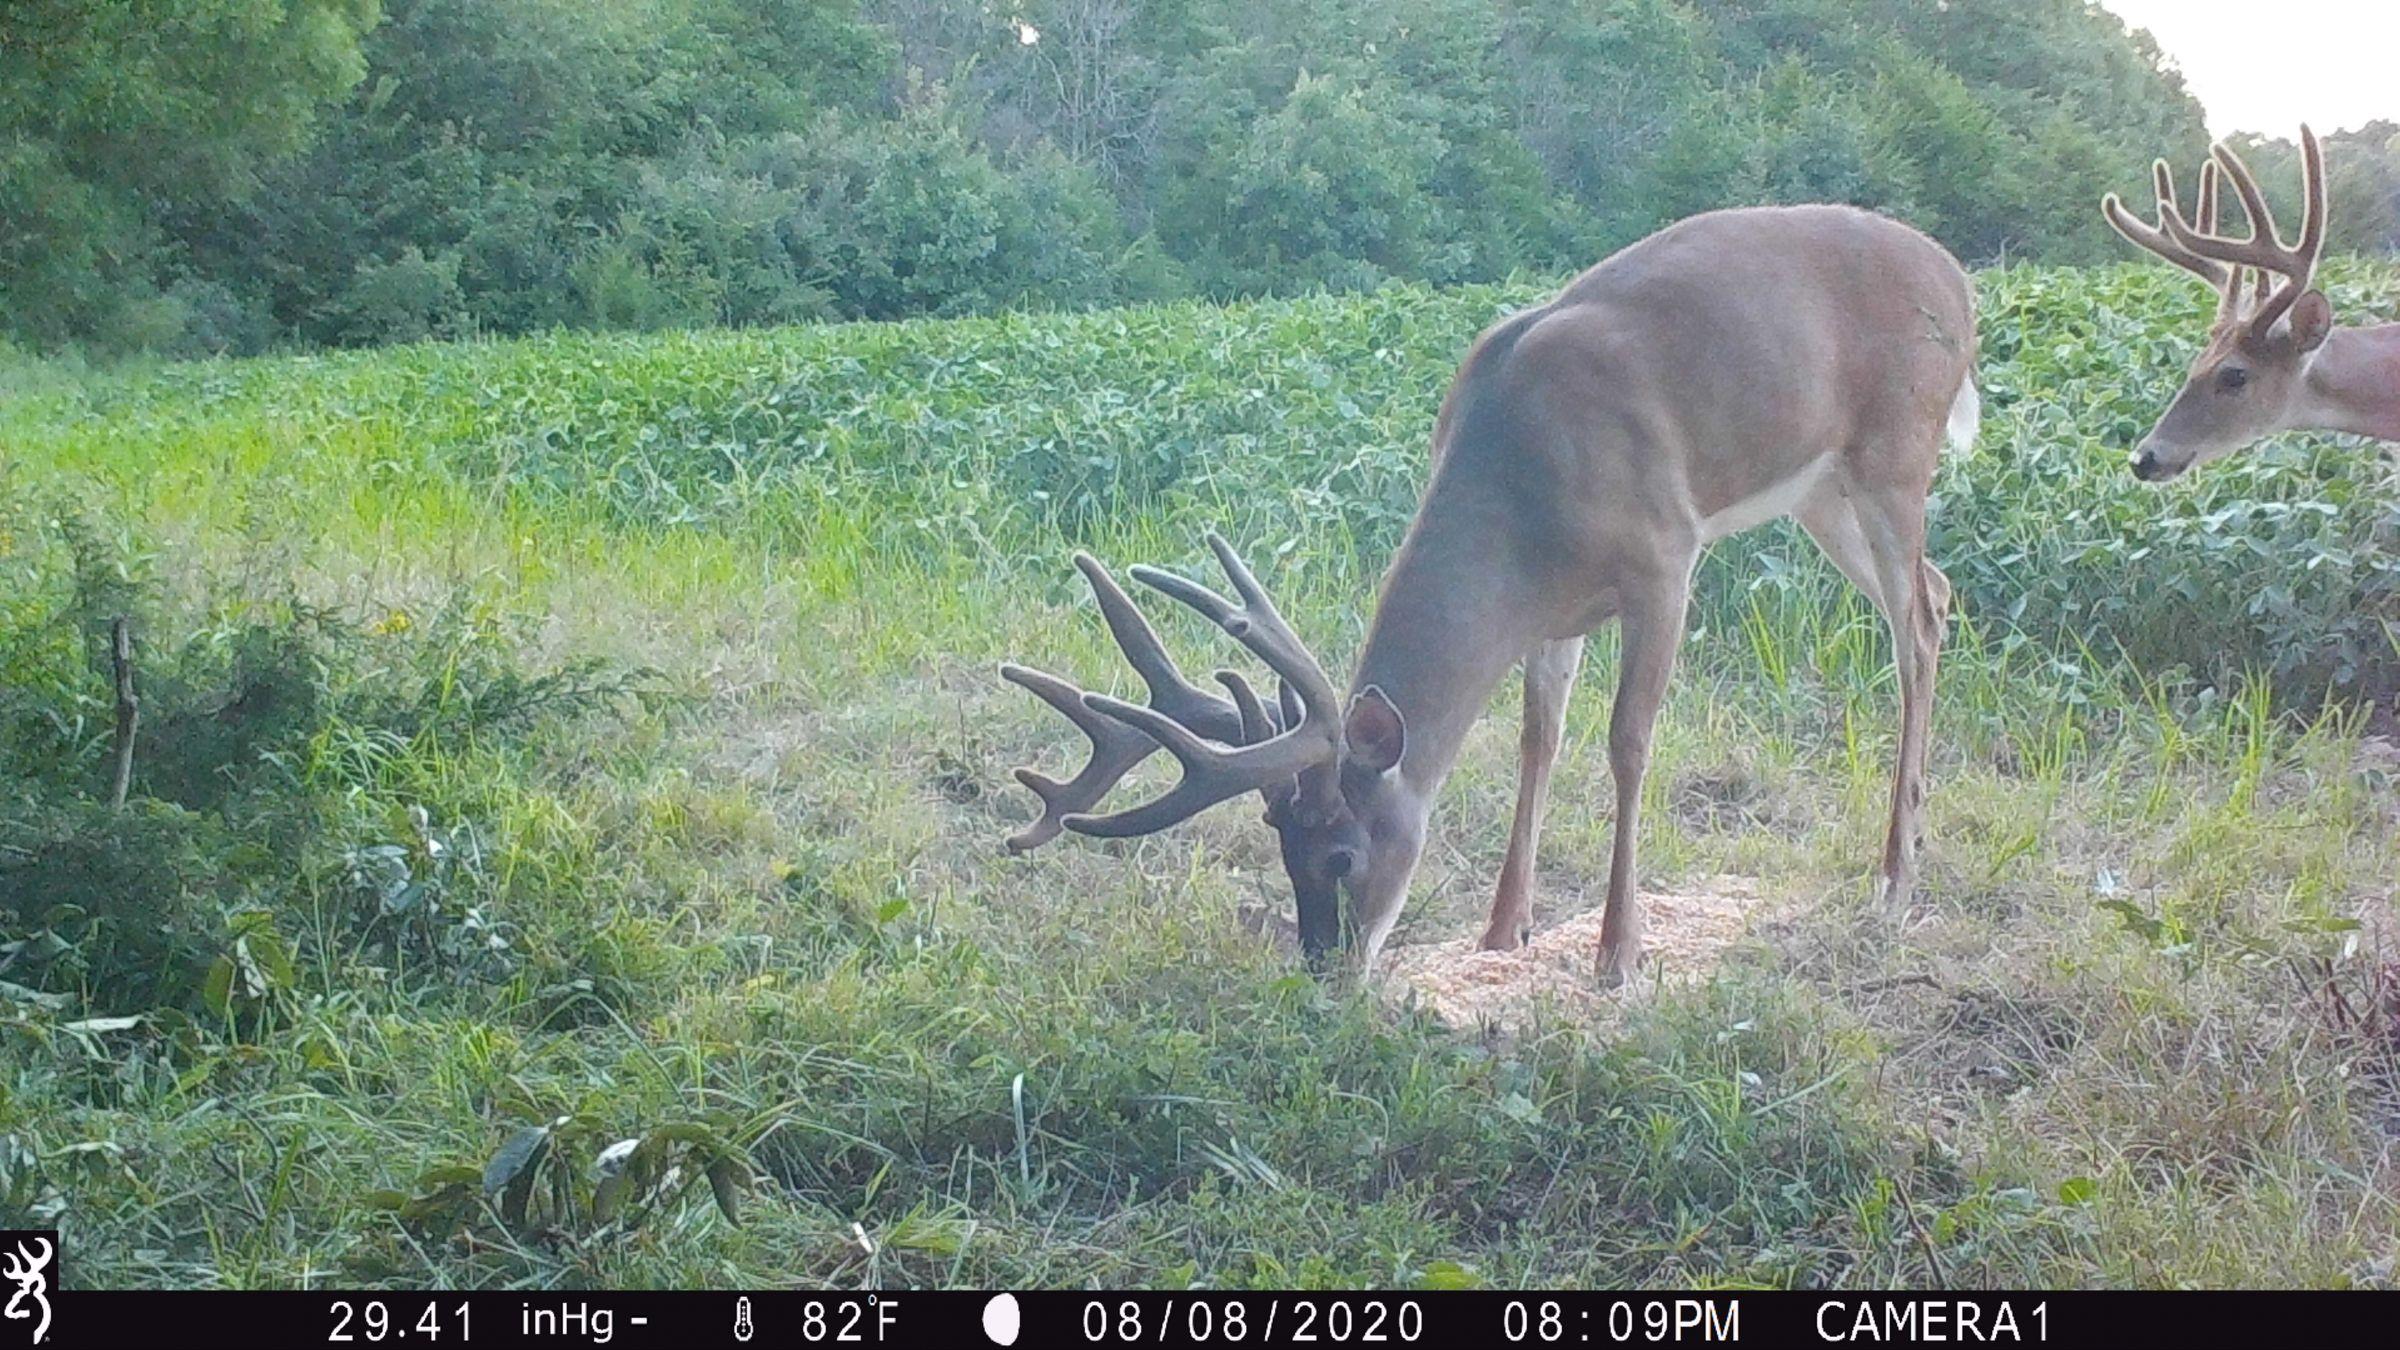 land-lee-county-iowa-328-acres-listing-number-15137-0-2020-08-27-175654.JPG